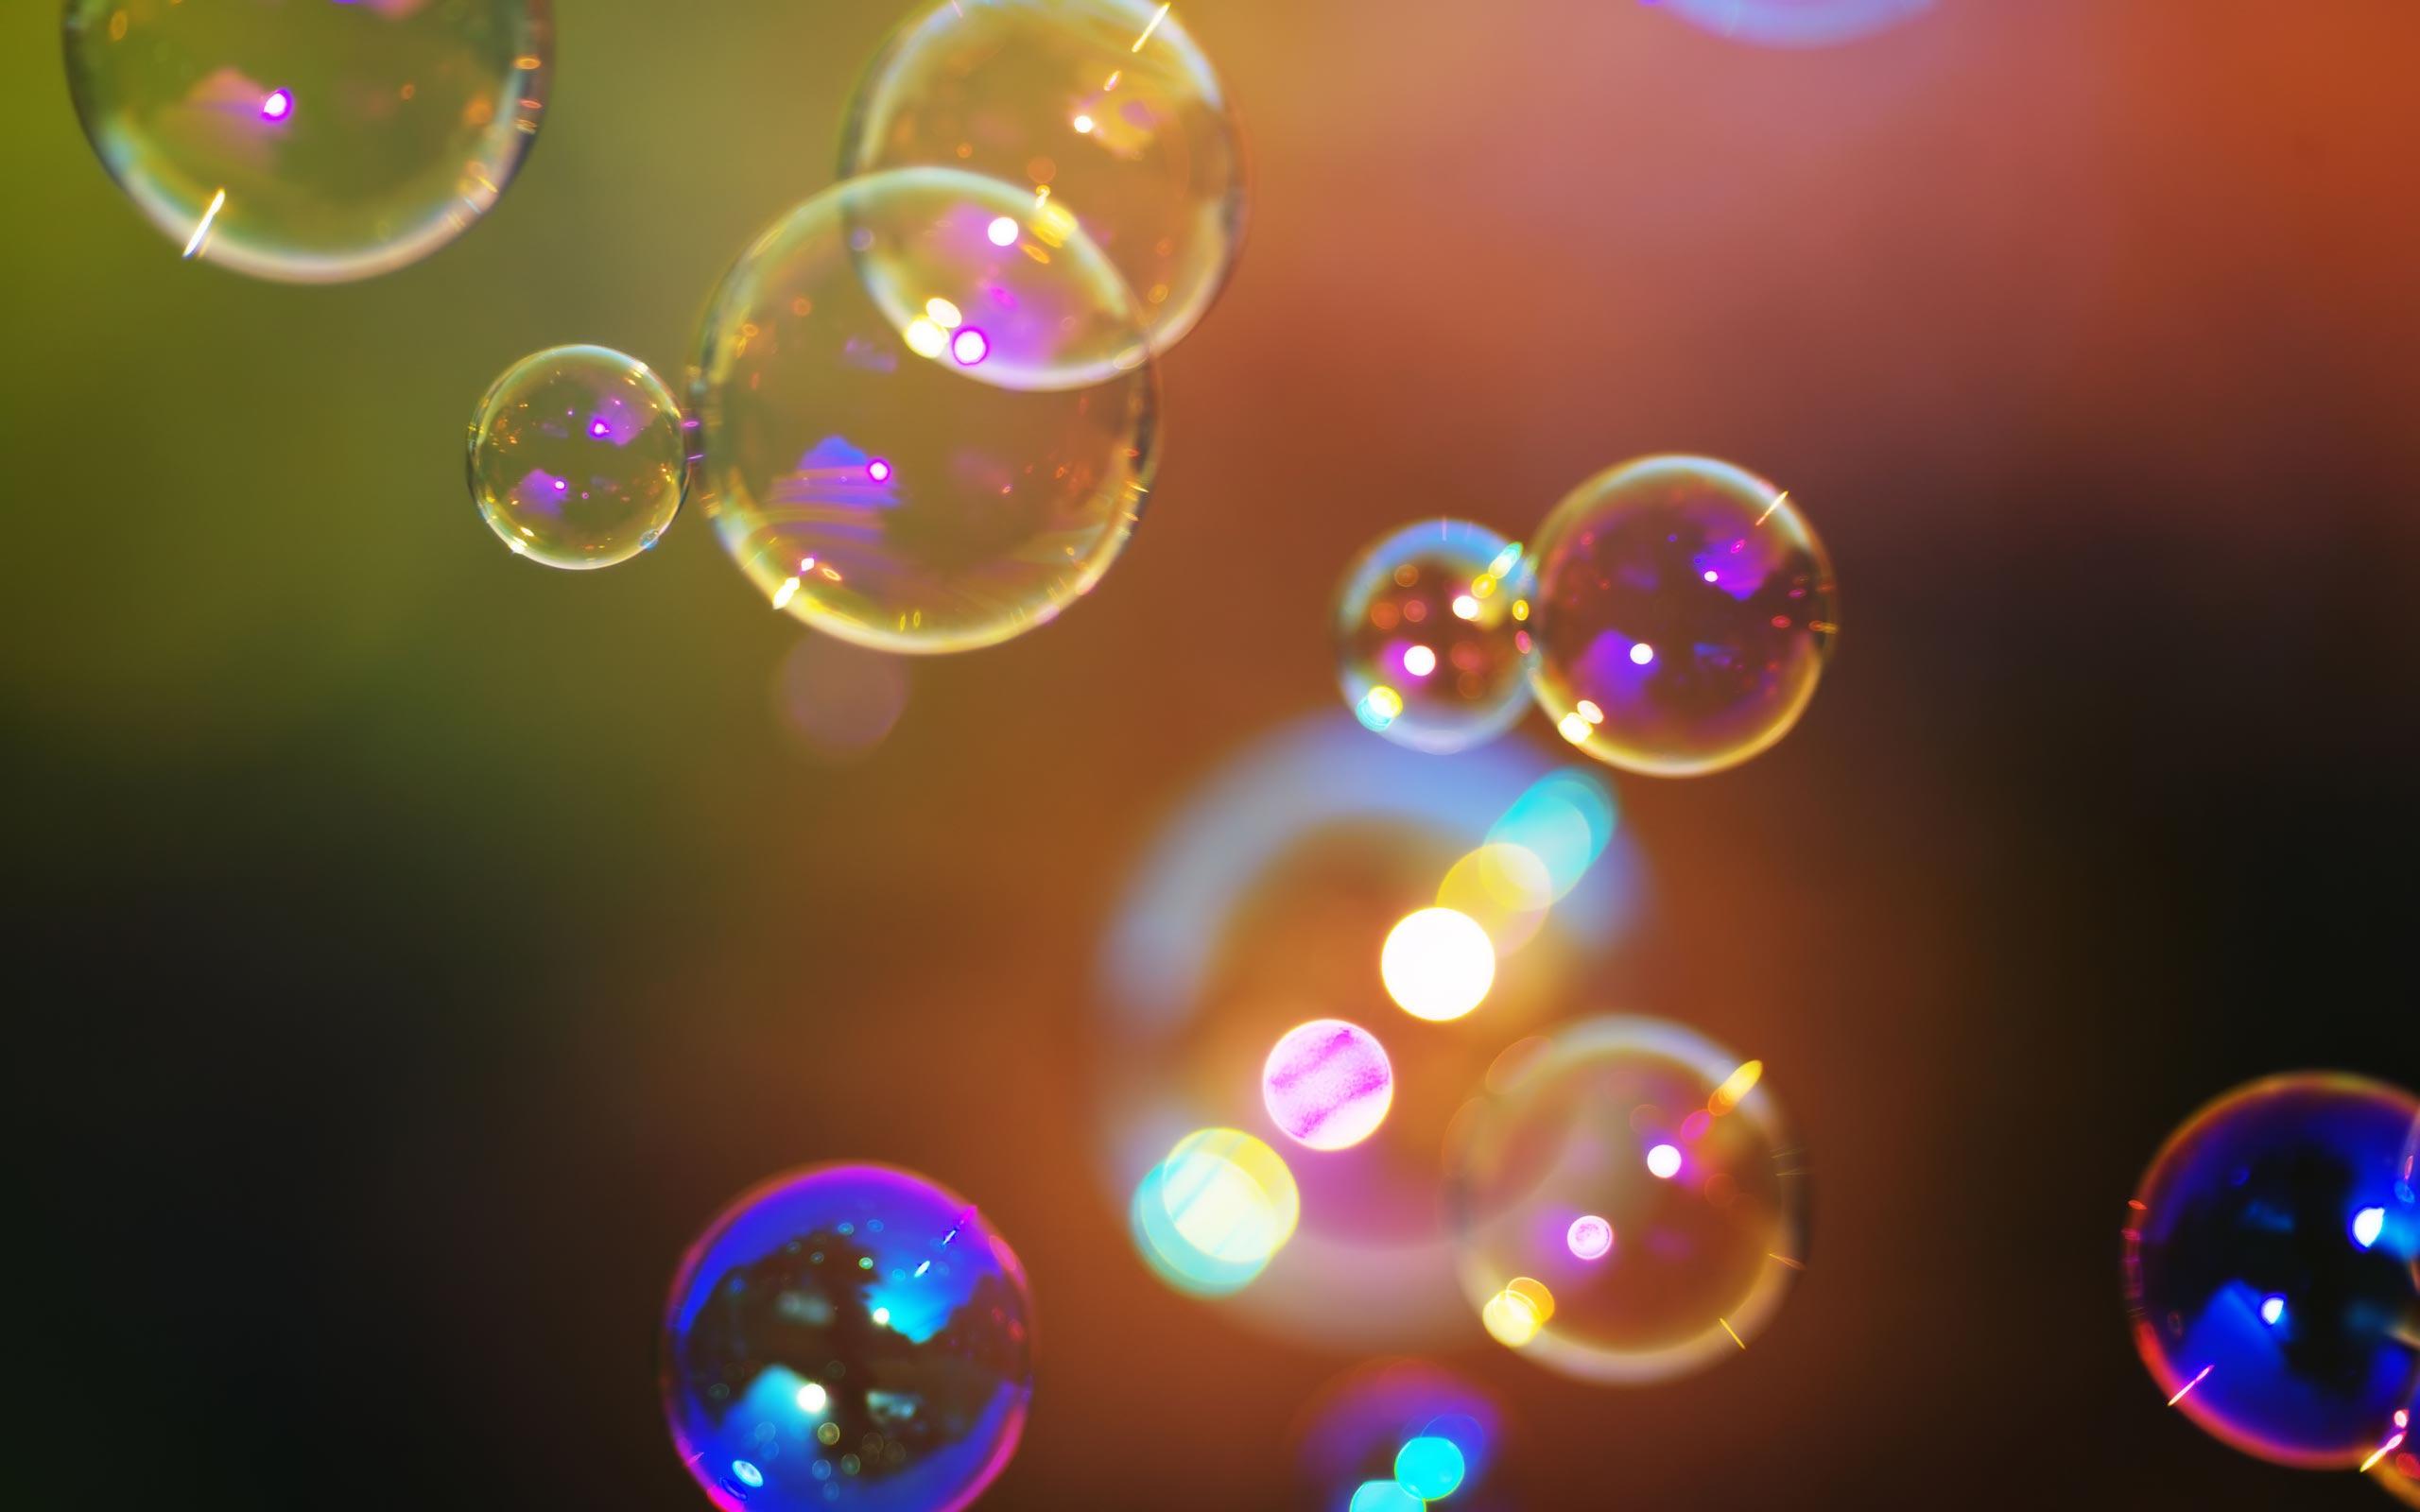 Desktop Wallpaper · Gallery · Miscellaneous Bubble blowers